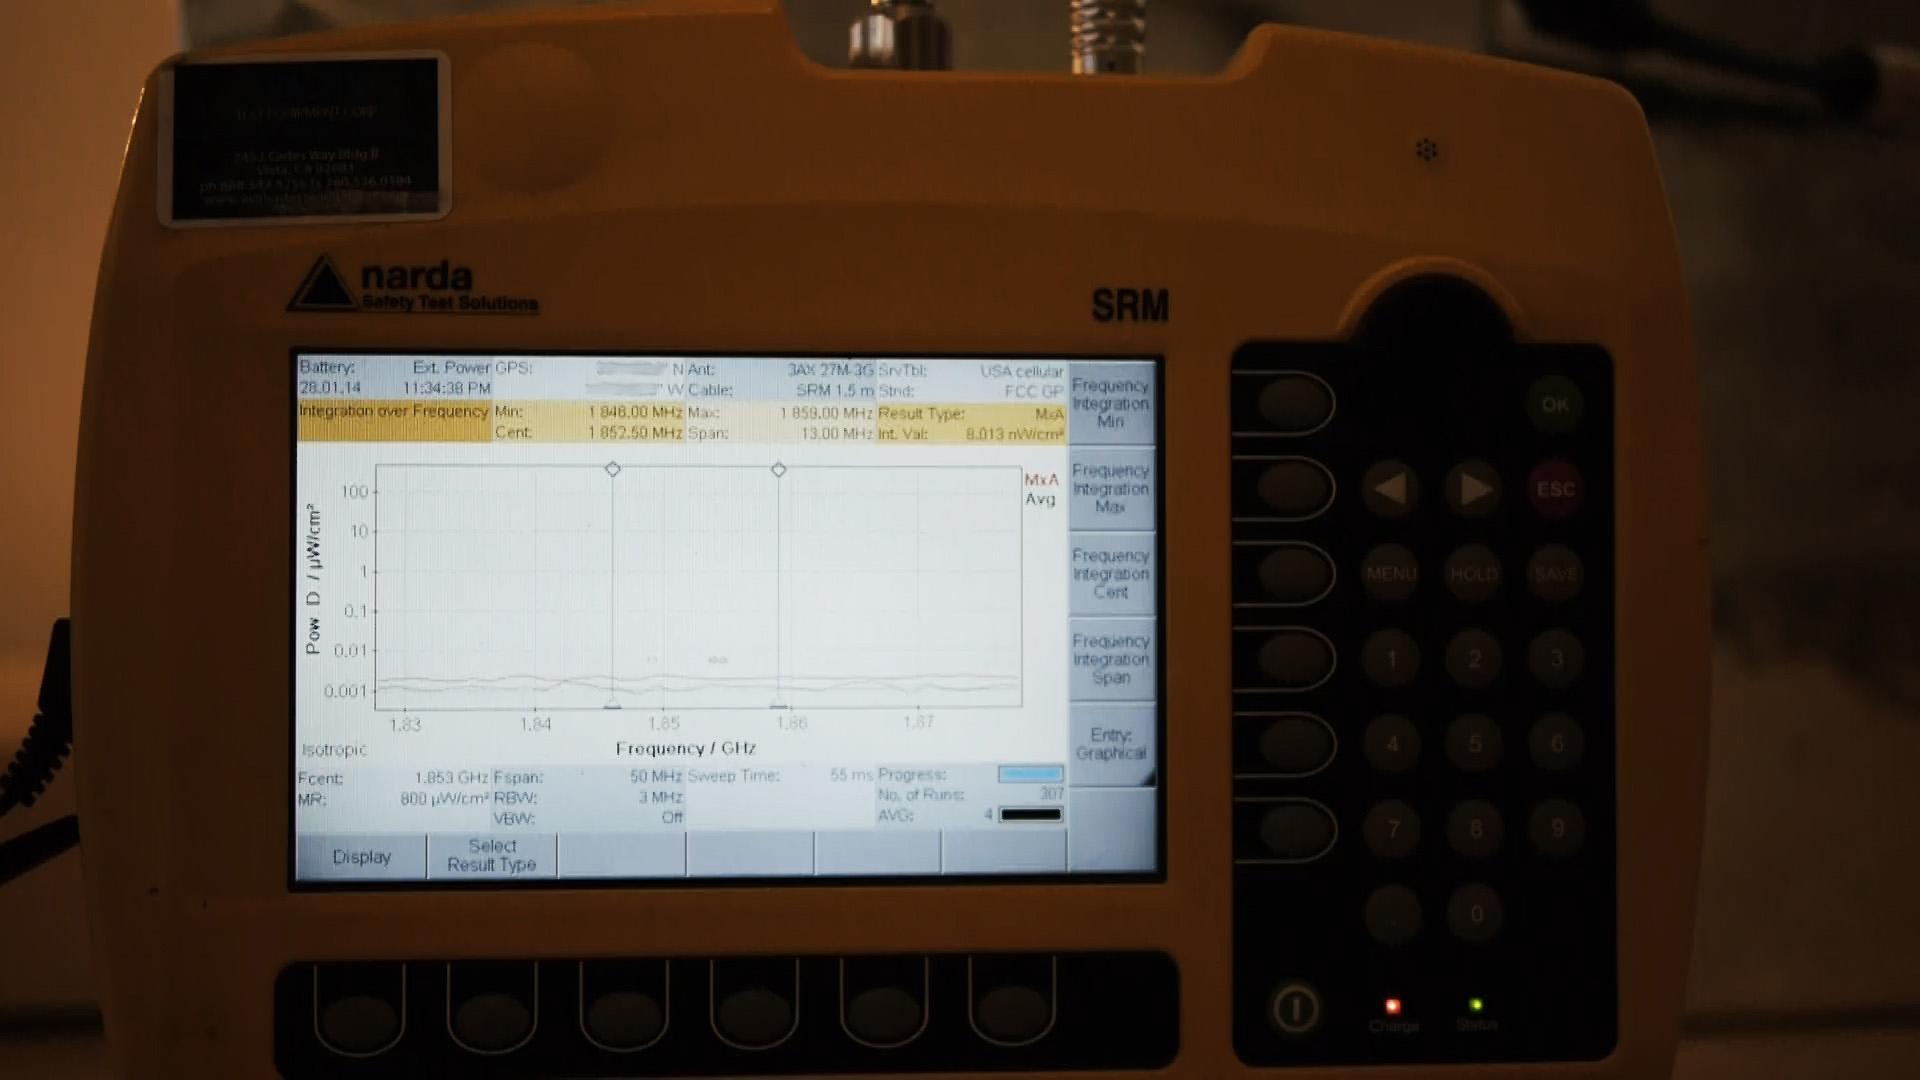 eFLEKTOR test Narda SRM-3006 baseline readings